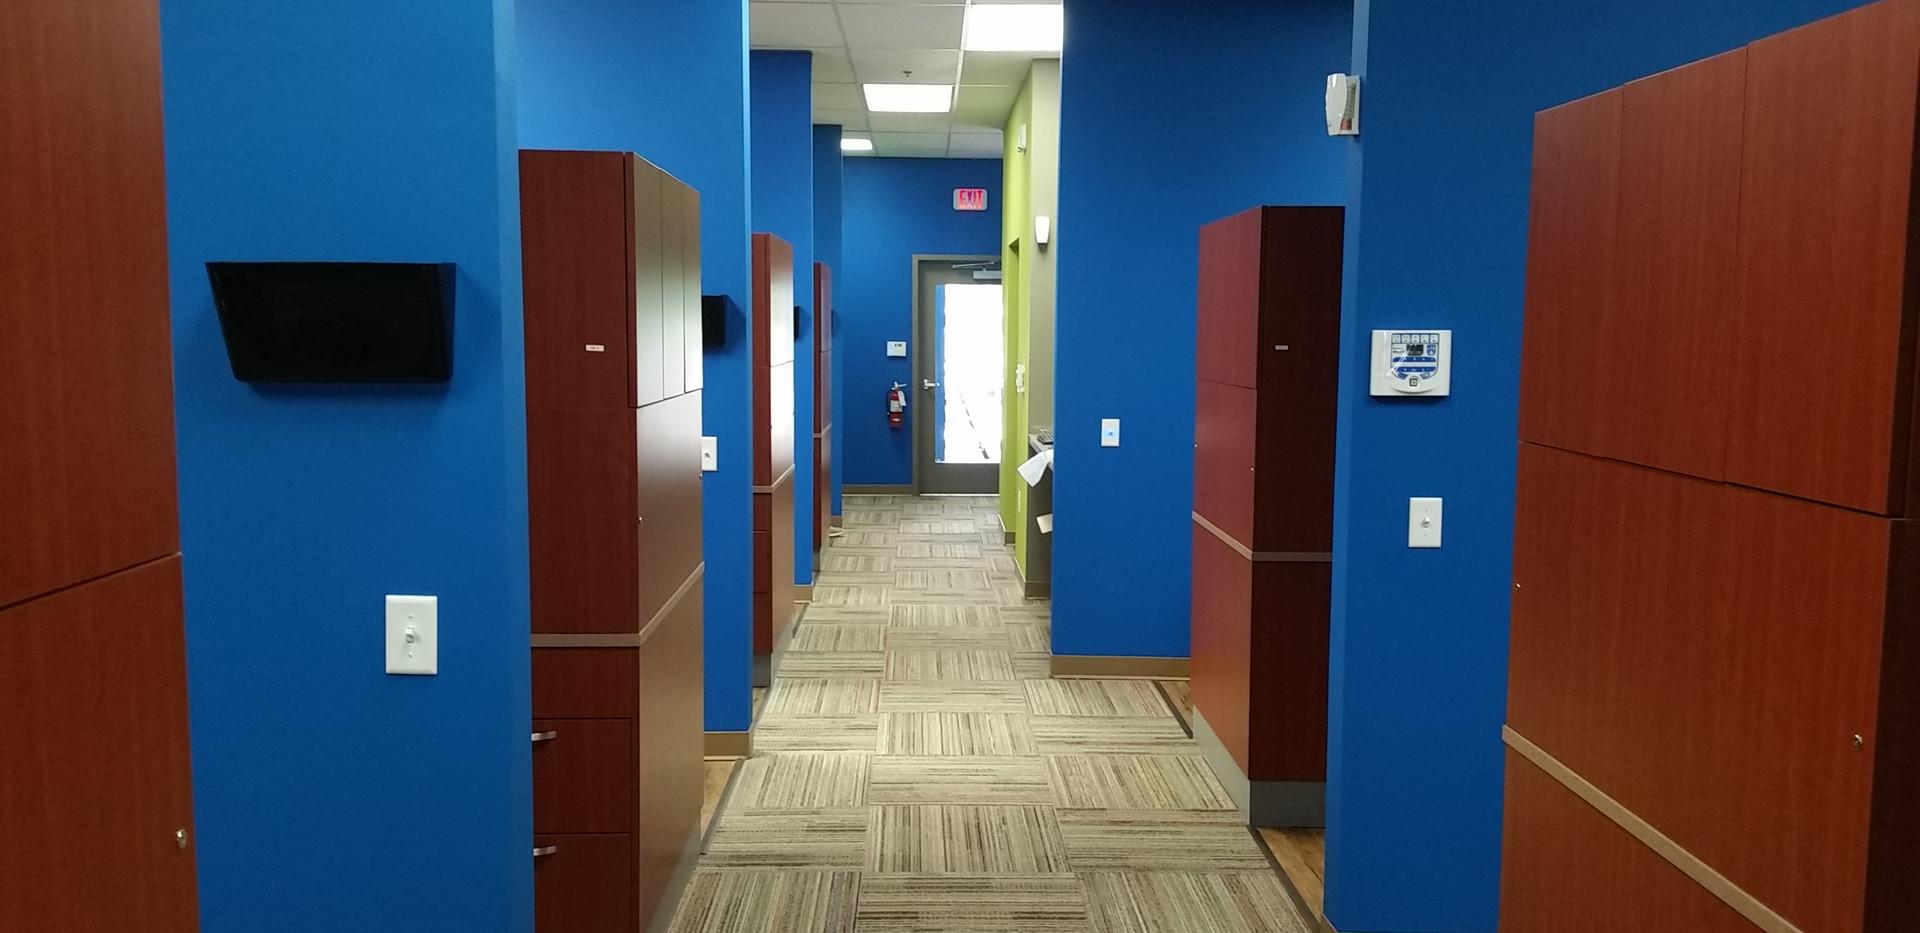 Dental Office Hallway - Buildout Pros